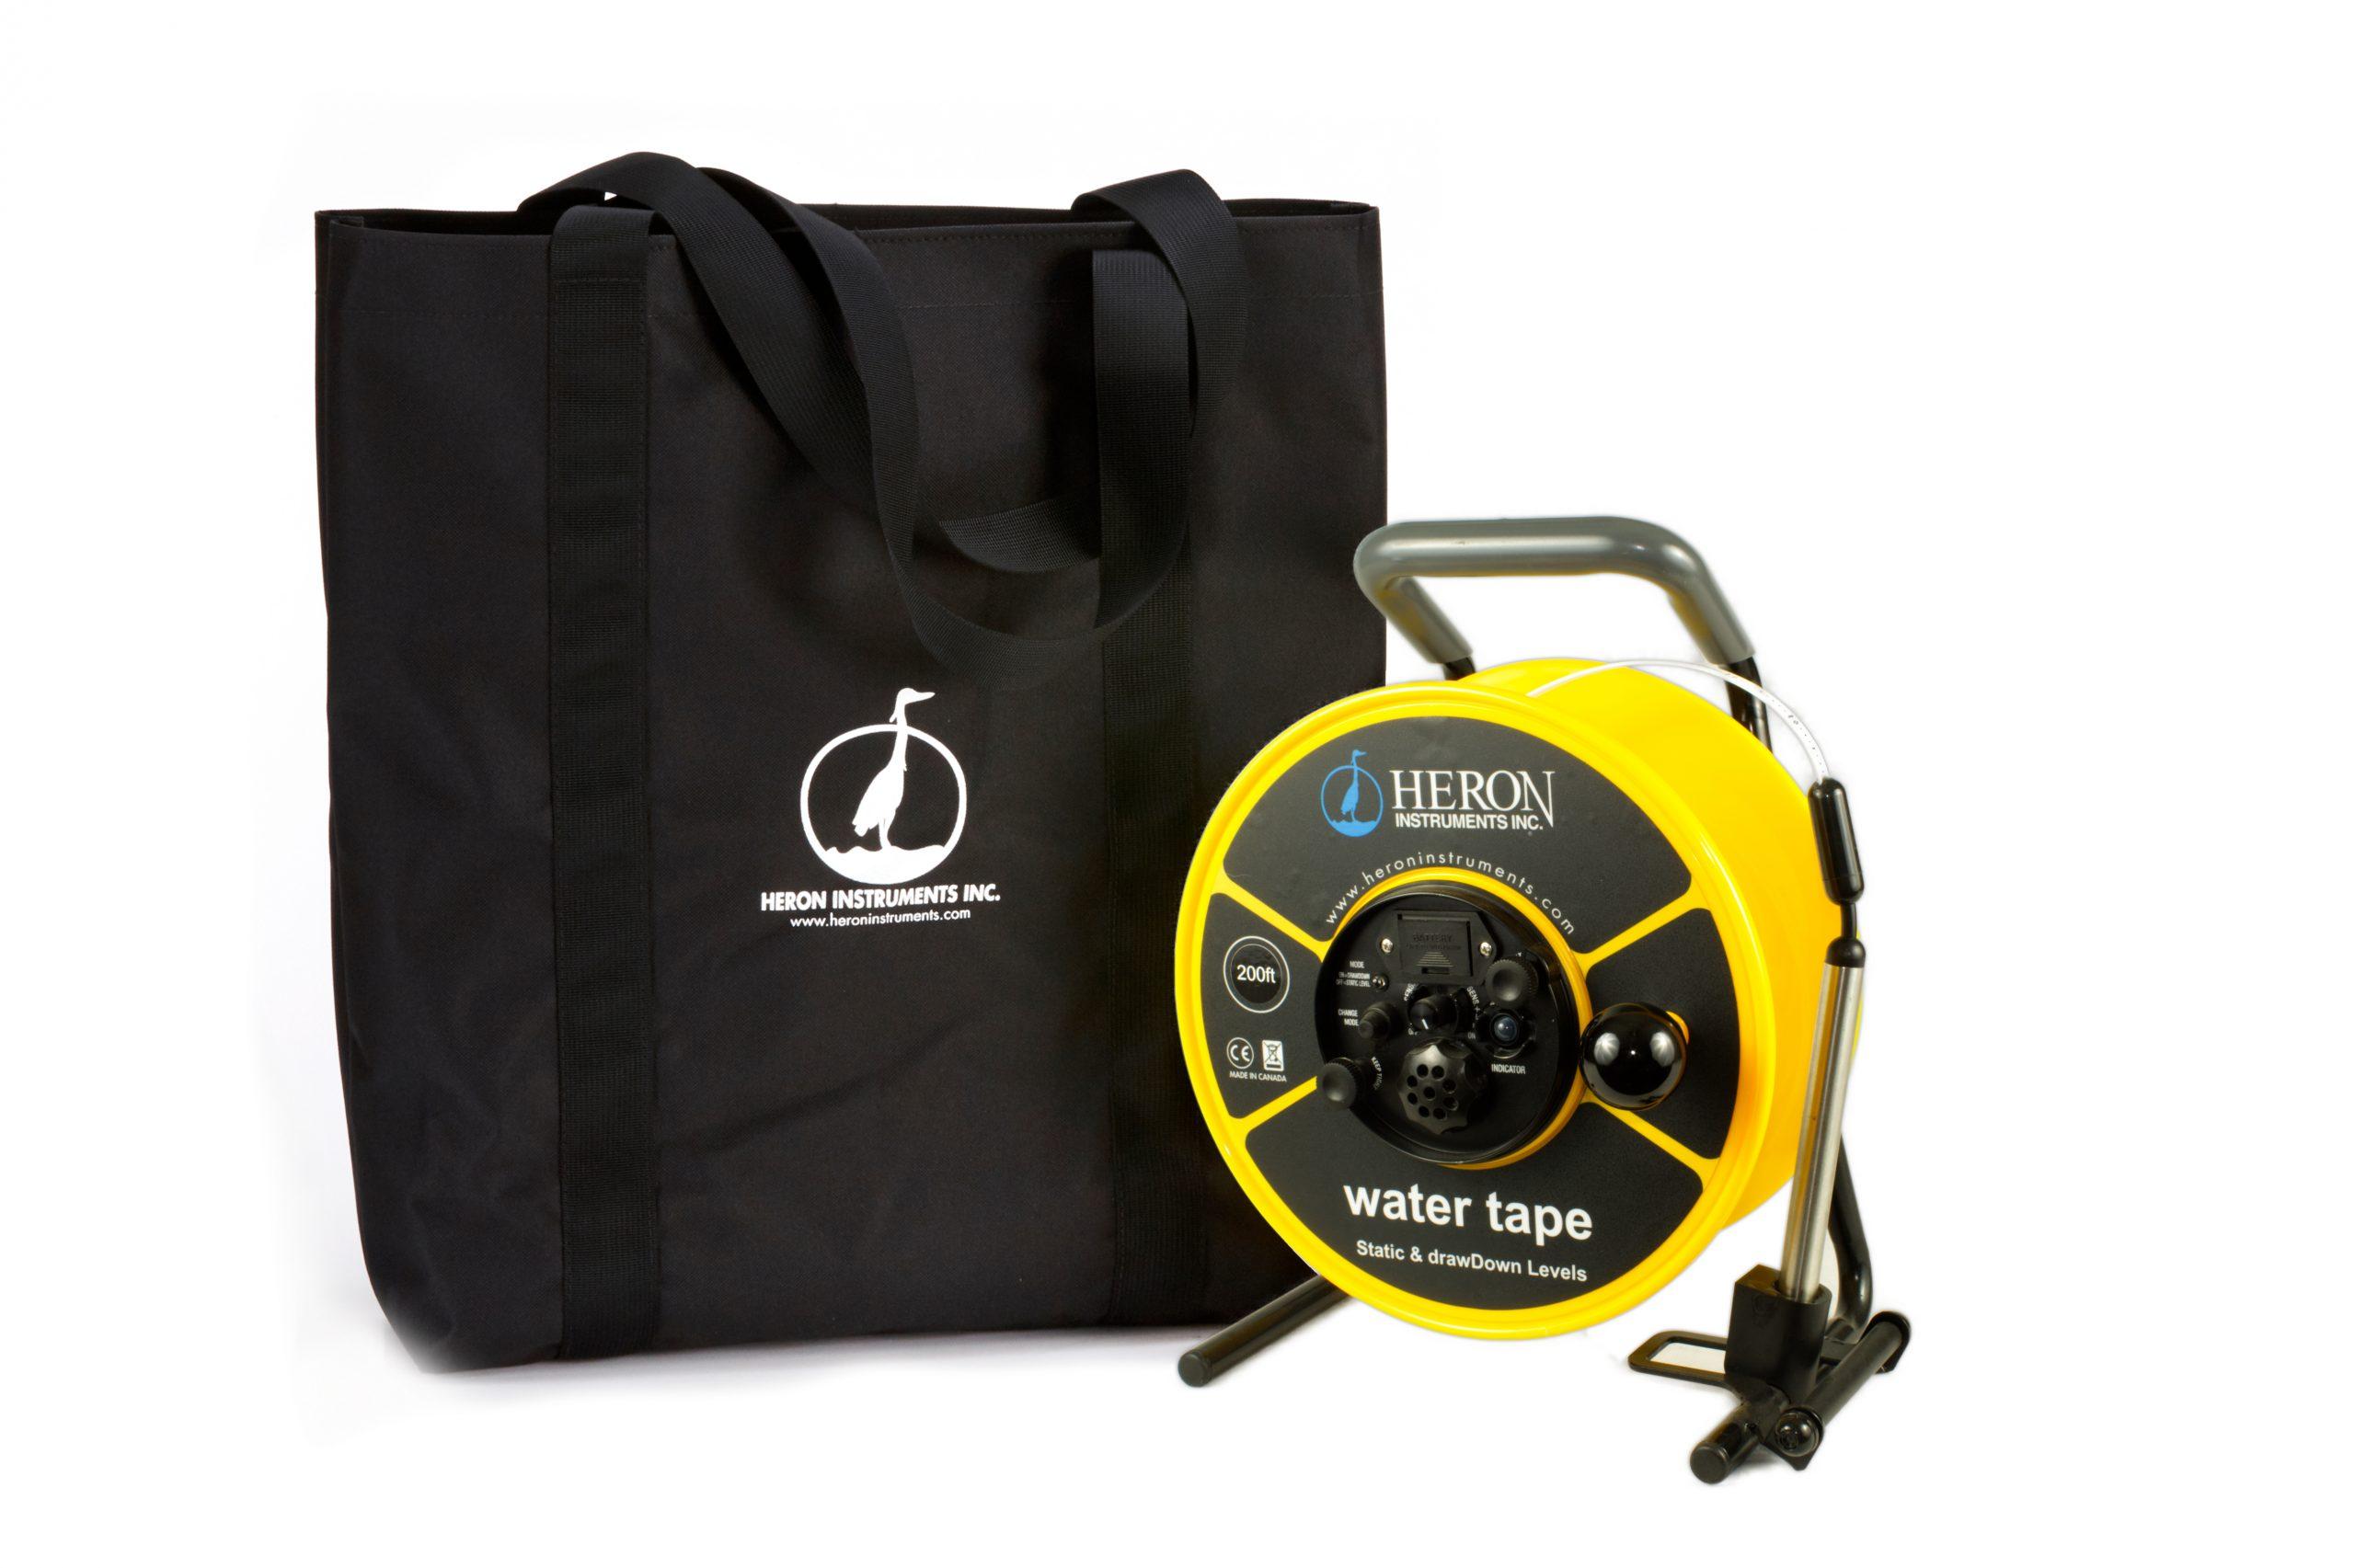 water tape economical water level meter